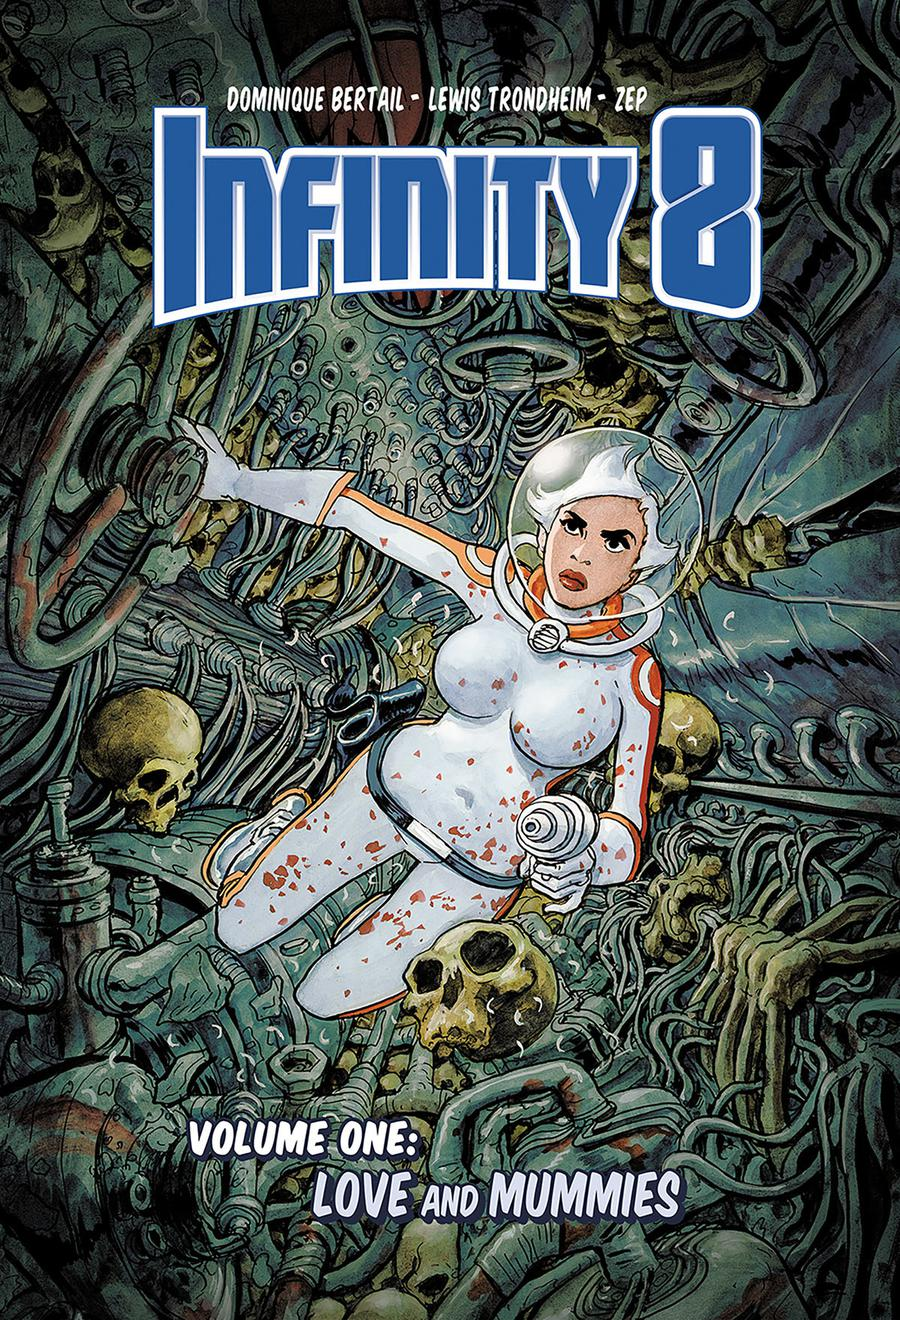 Infinity 8 Vol 1 Love And Mummies HC